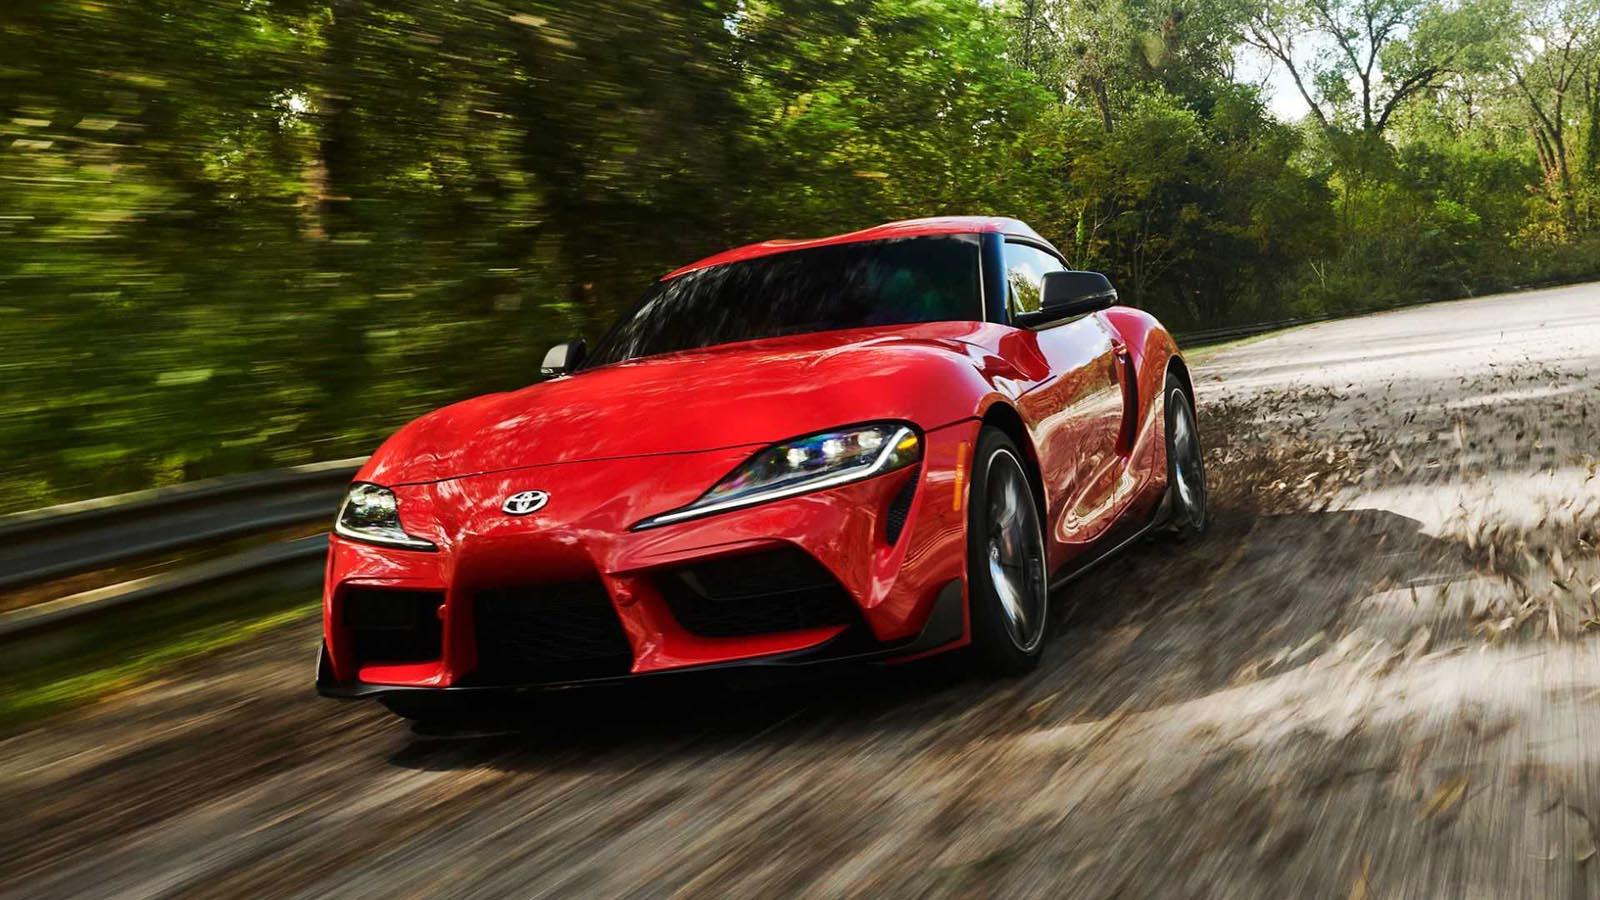 Photo of Επίσημο ντεμπούτο για τη νέα Toyota Supra [vid]